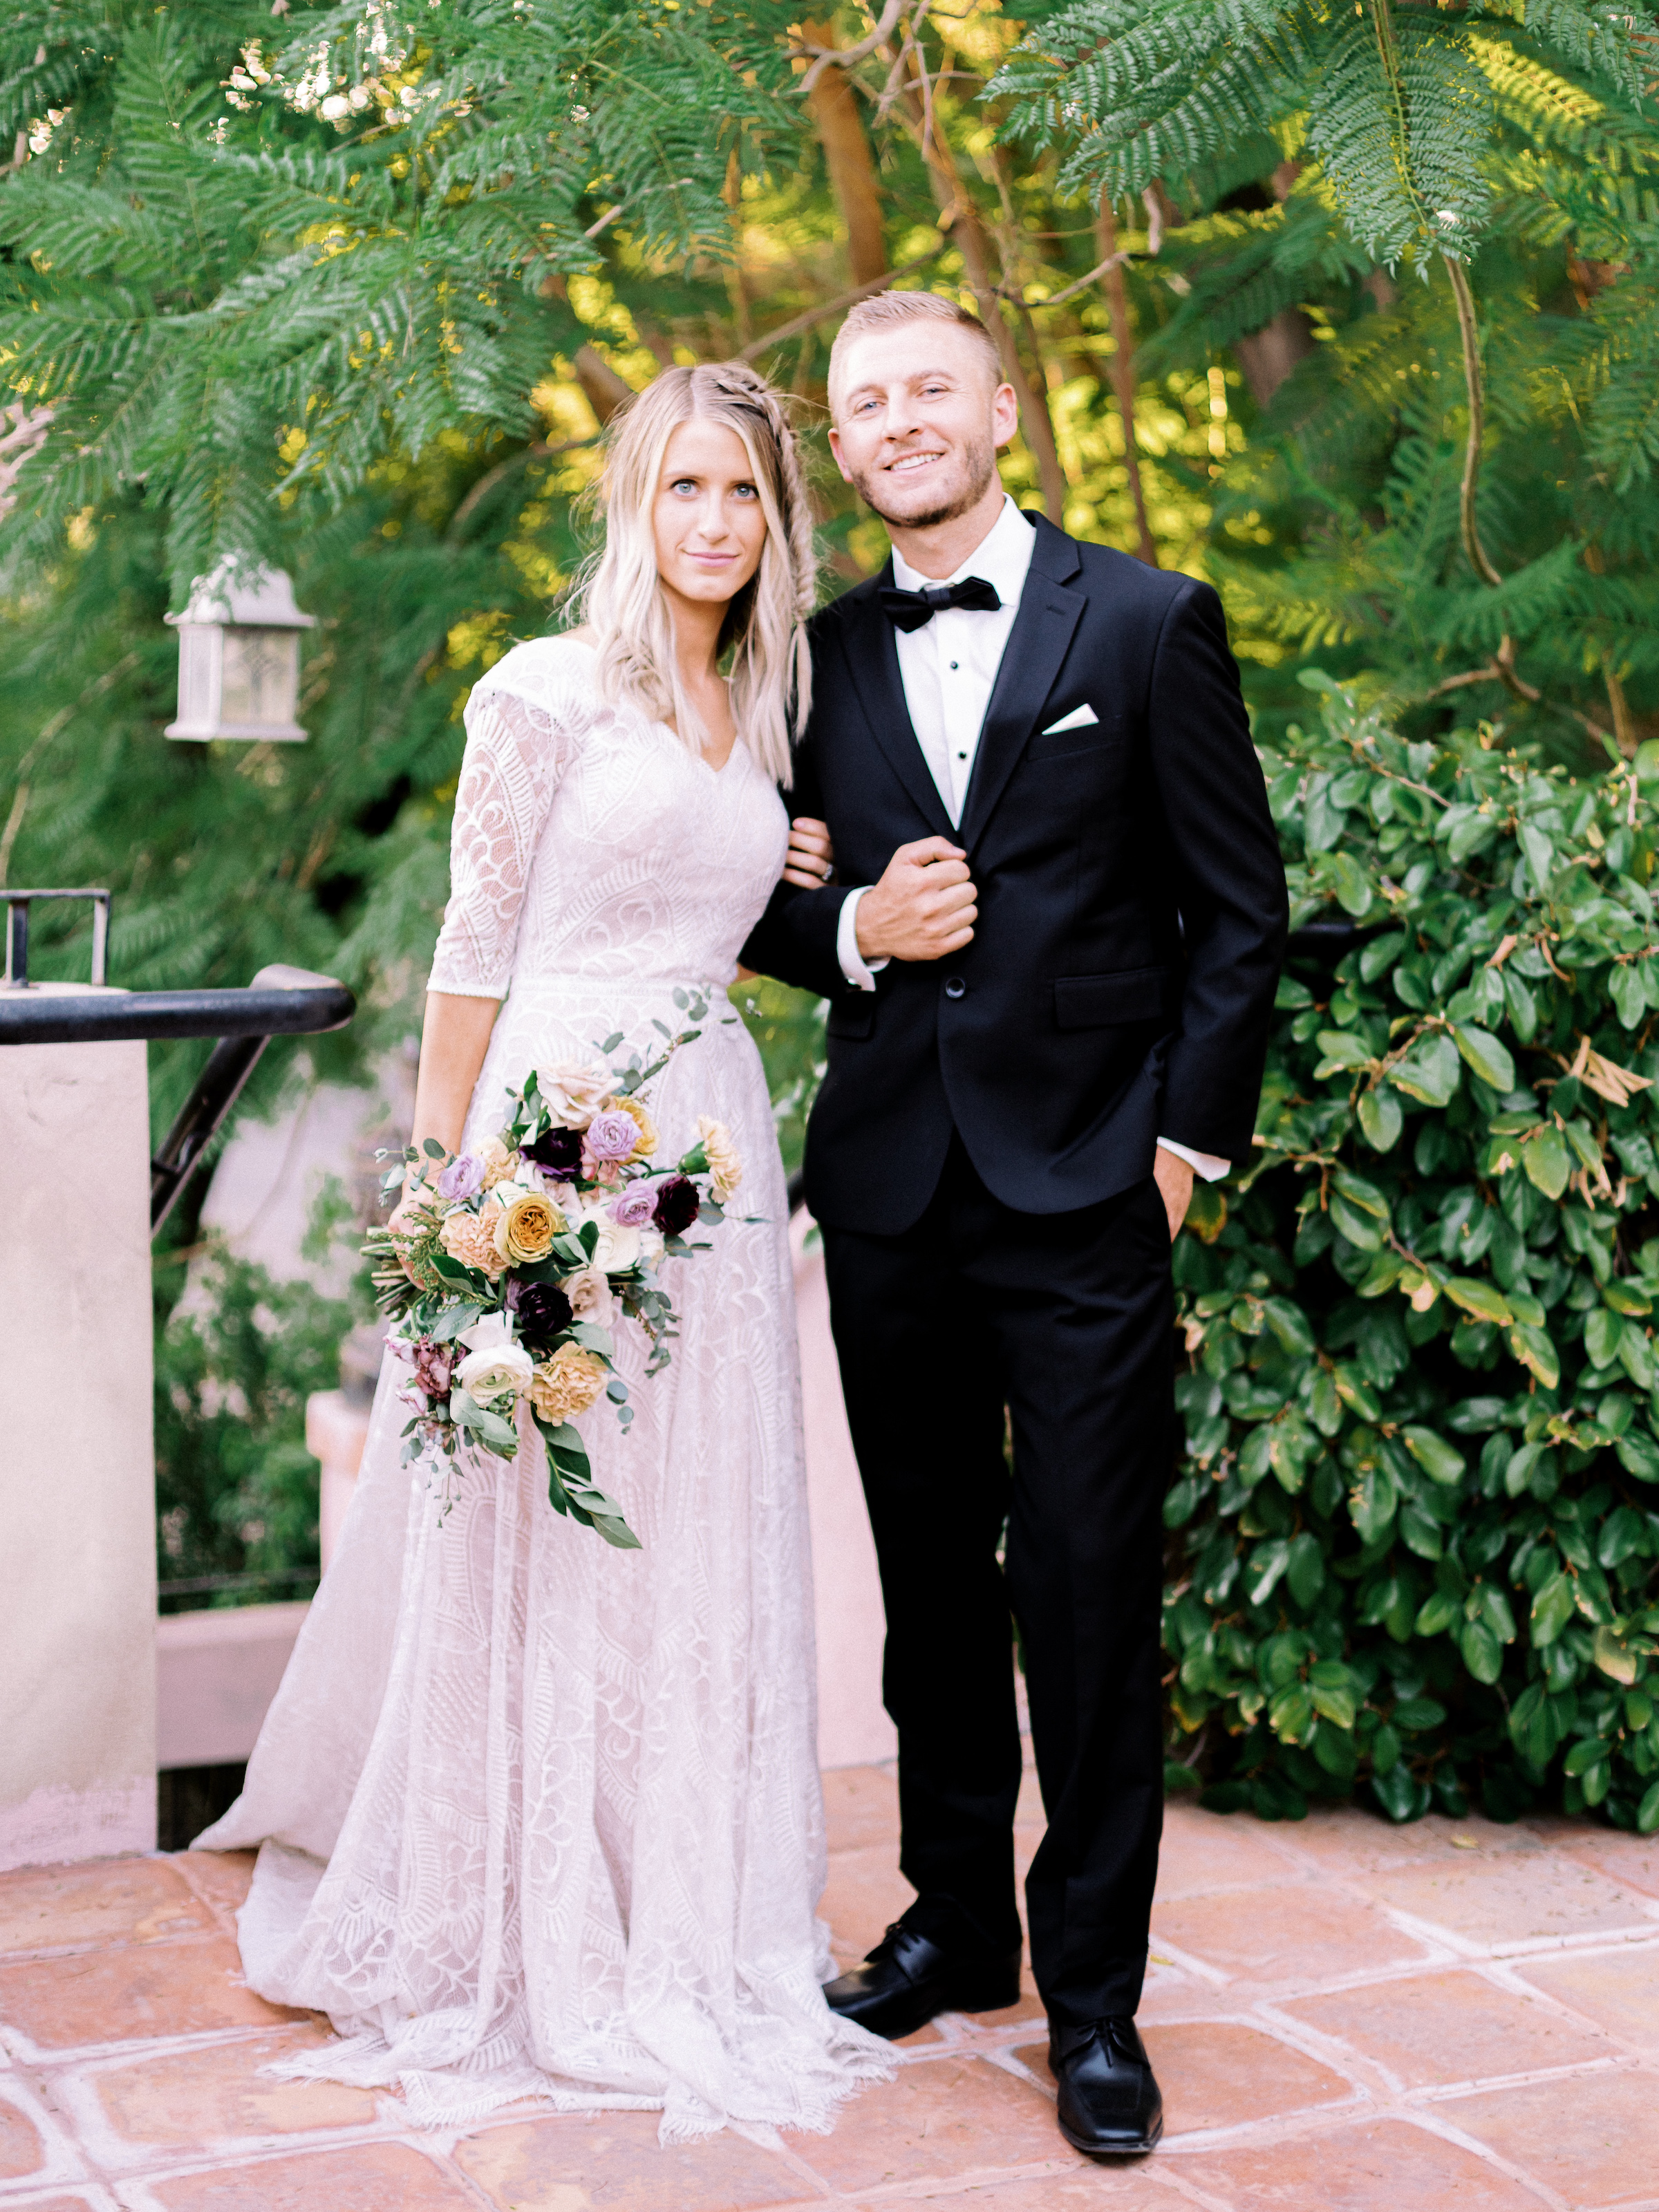 Boho Chic Long Sleeve Wedding Dress Fishtail Braid Wright House Truth And Beauty Photography 7